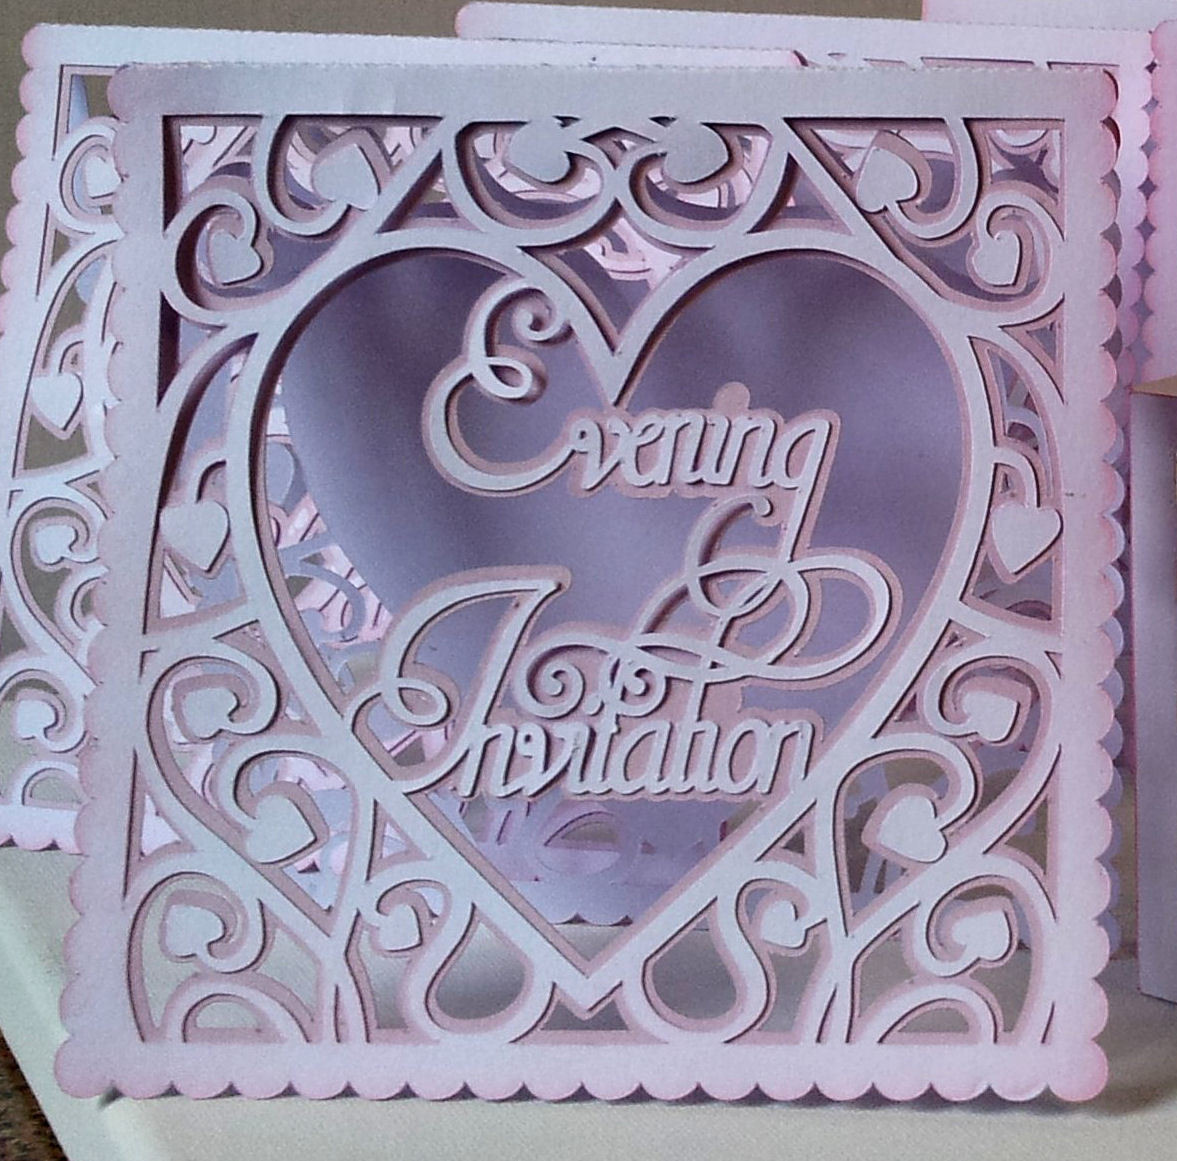 Heart Swirls Evening Wedding Invitation card template